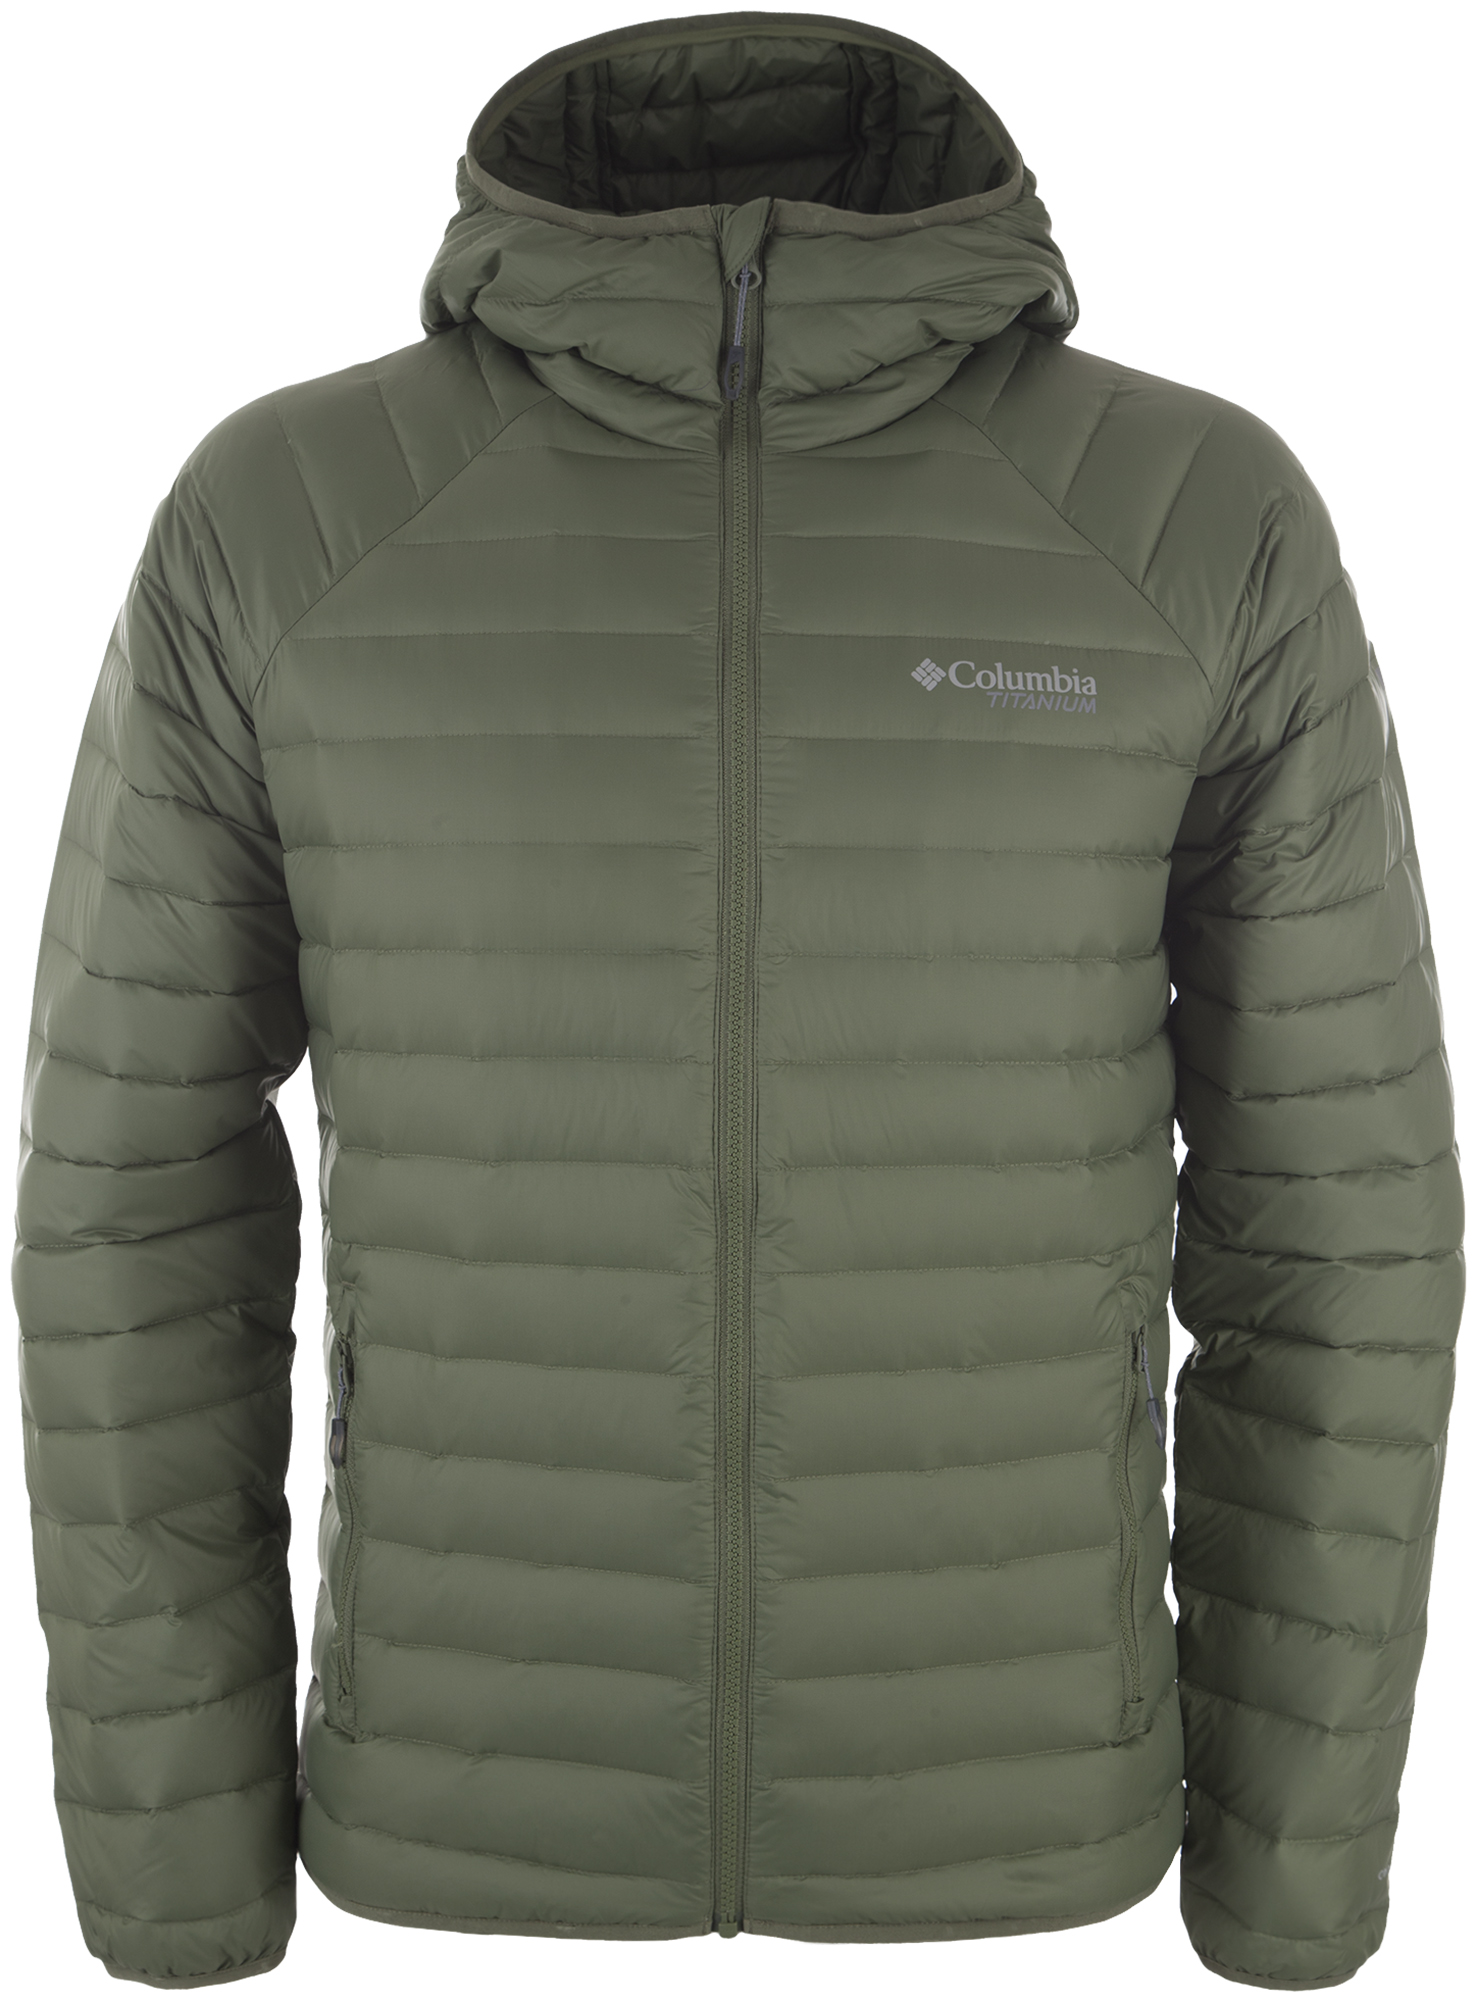 Columbia Куртка пуховая мужская Columbia Alpha Trail, размер 56-58